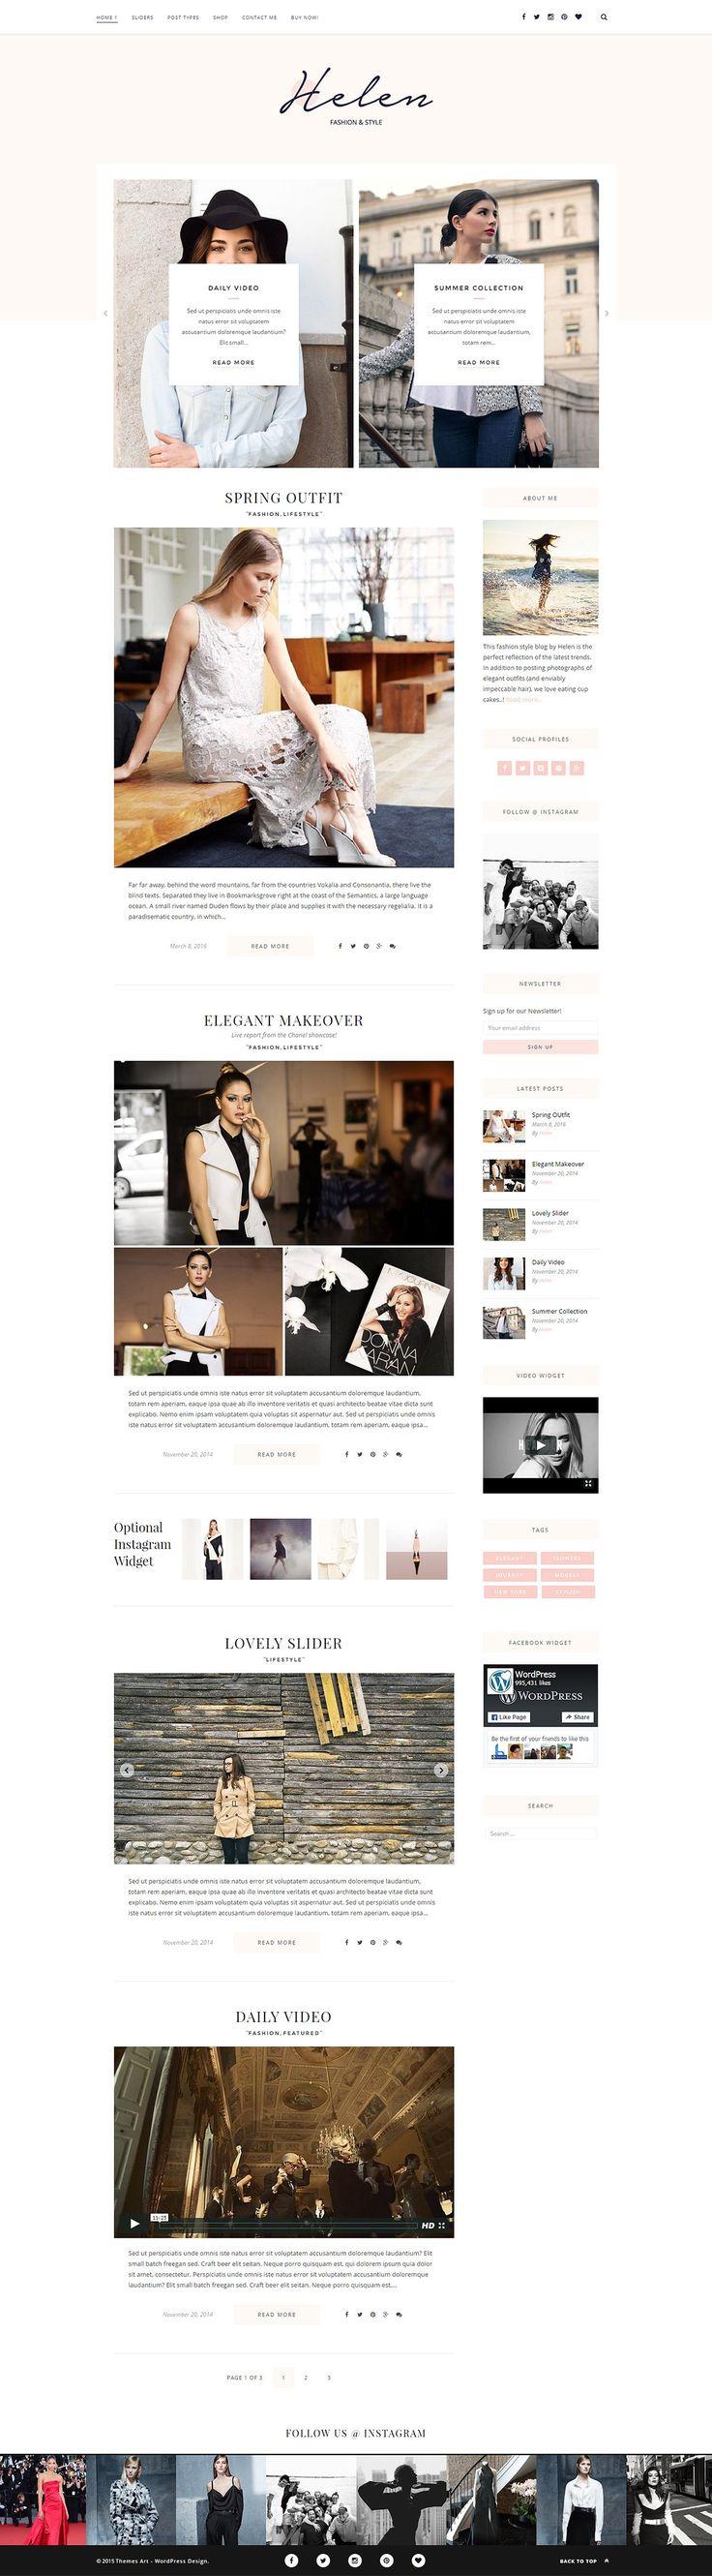 146 best WordPress themes images on Pinterest